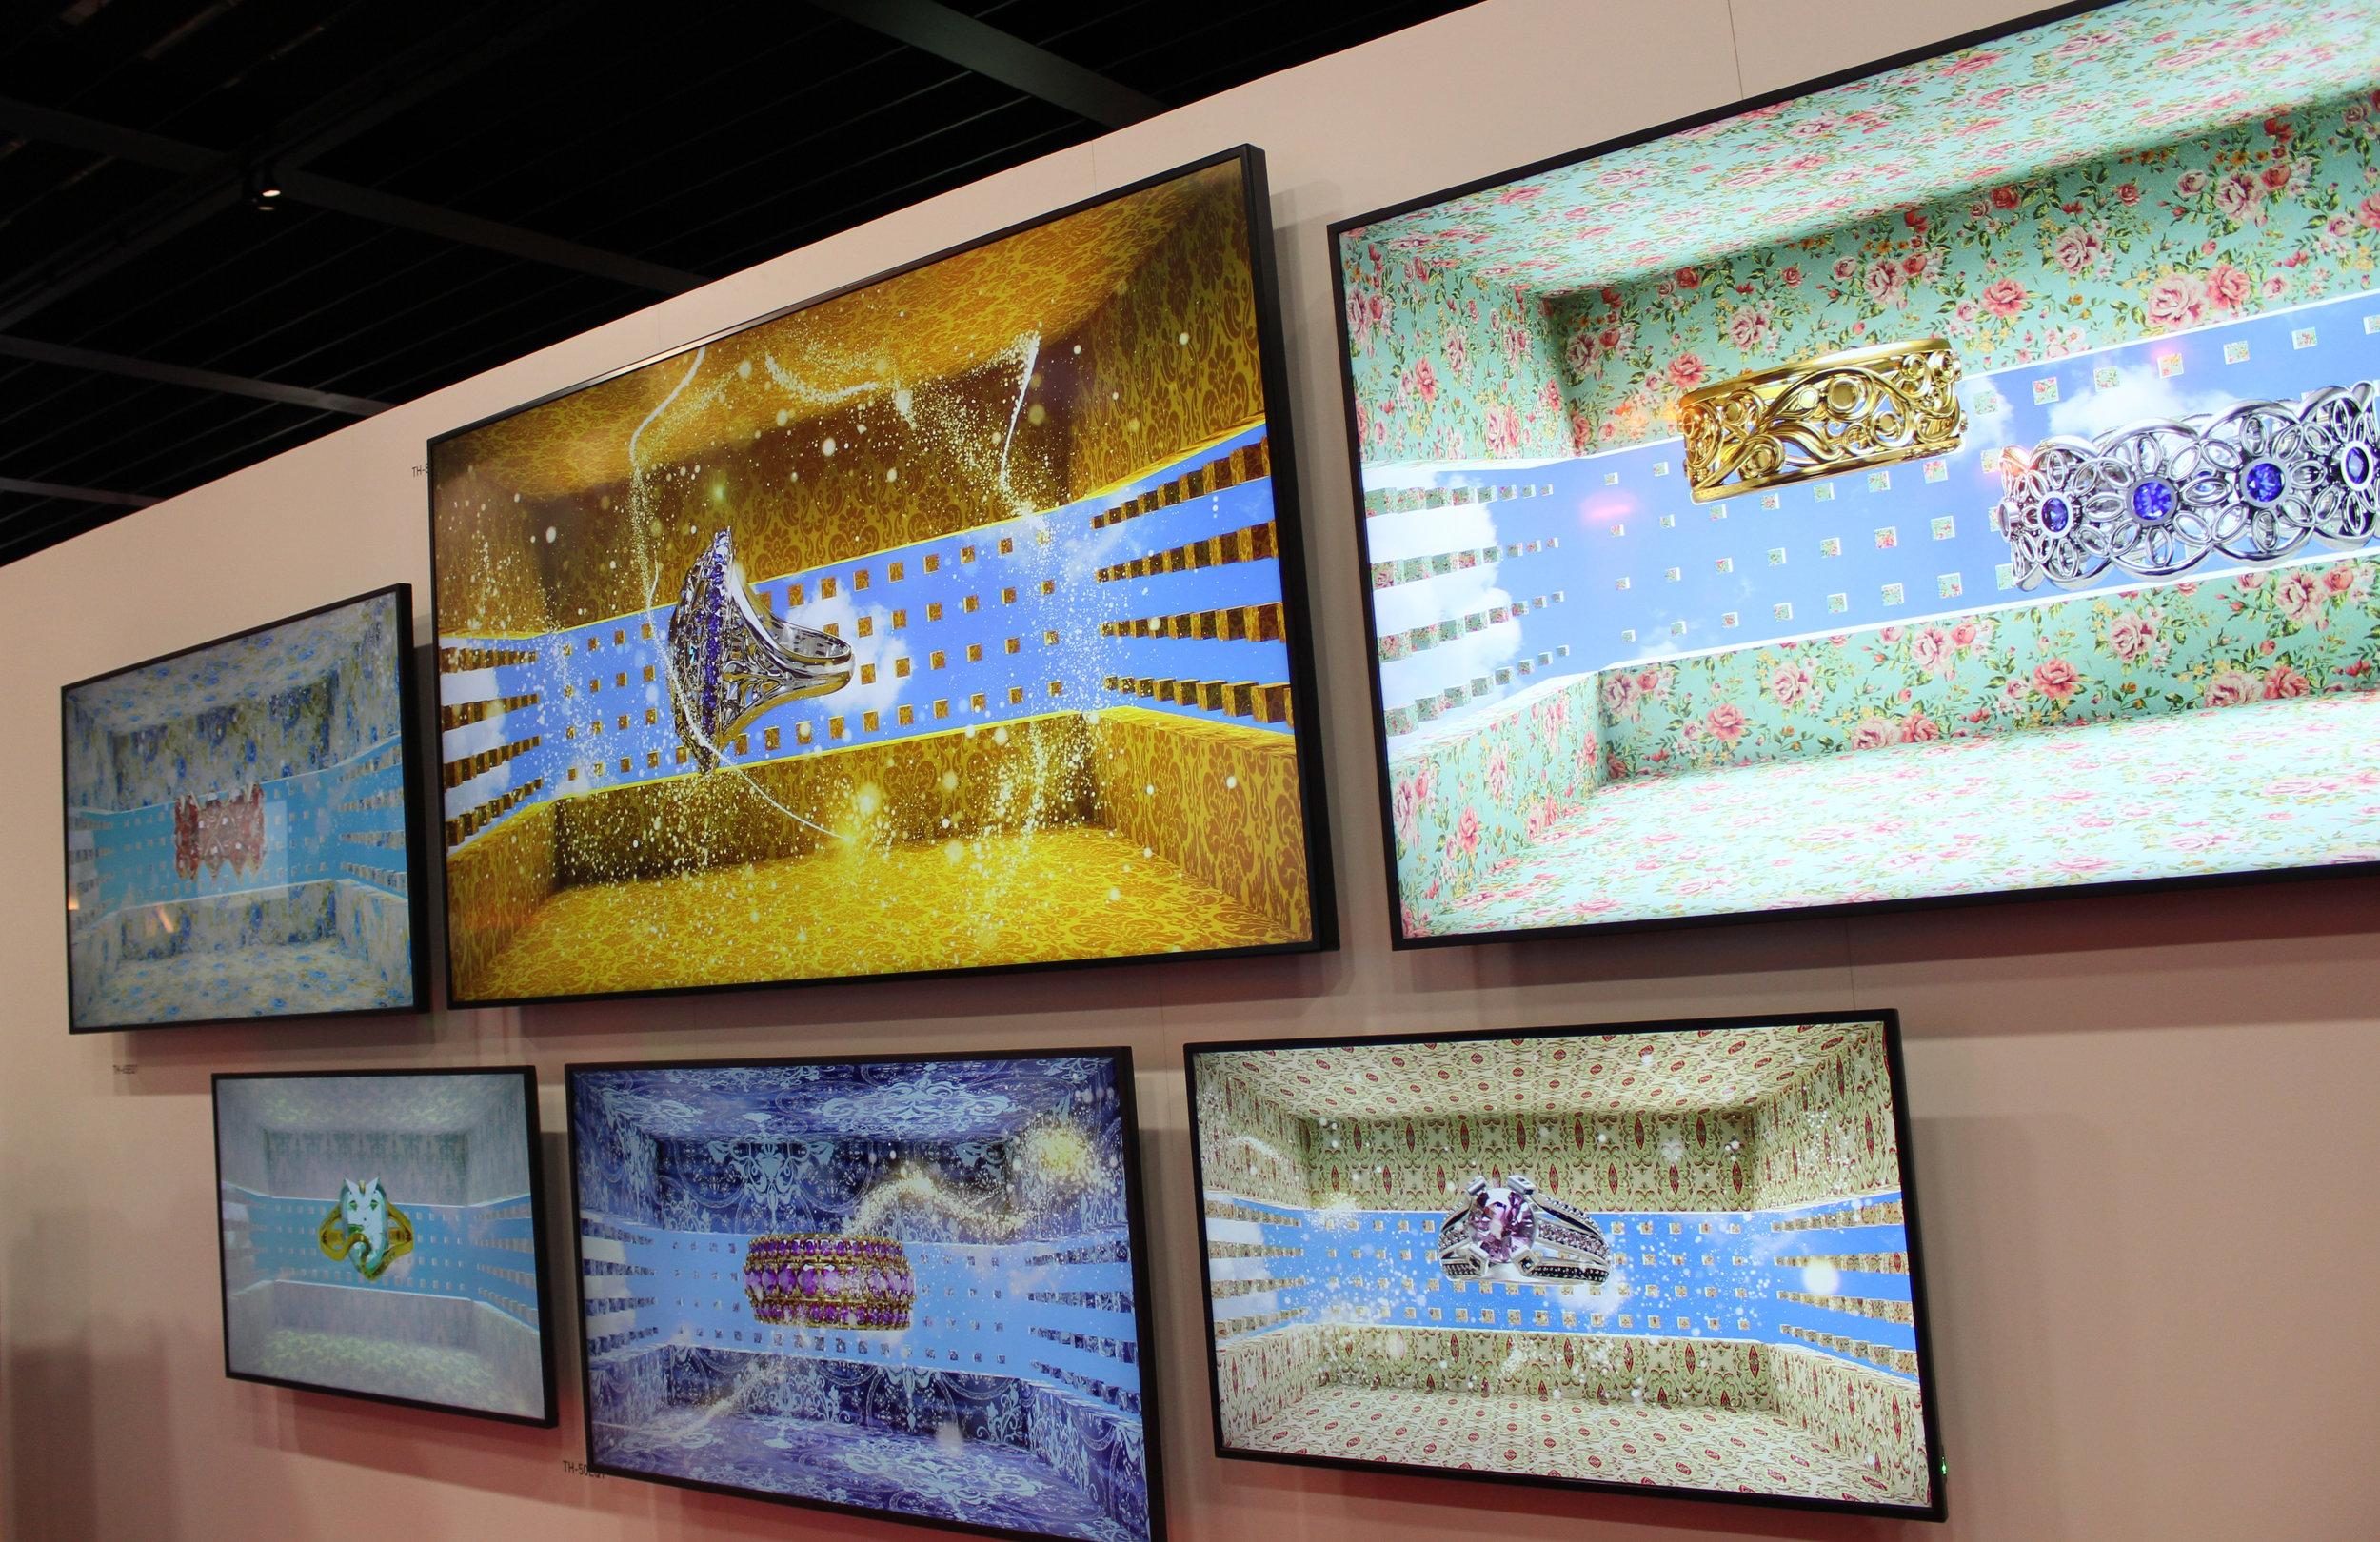 Panasonic demonstrerade sin skarpa teknologi bakom sina 4K-displayer.